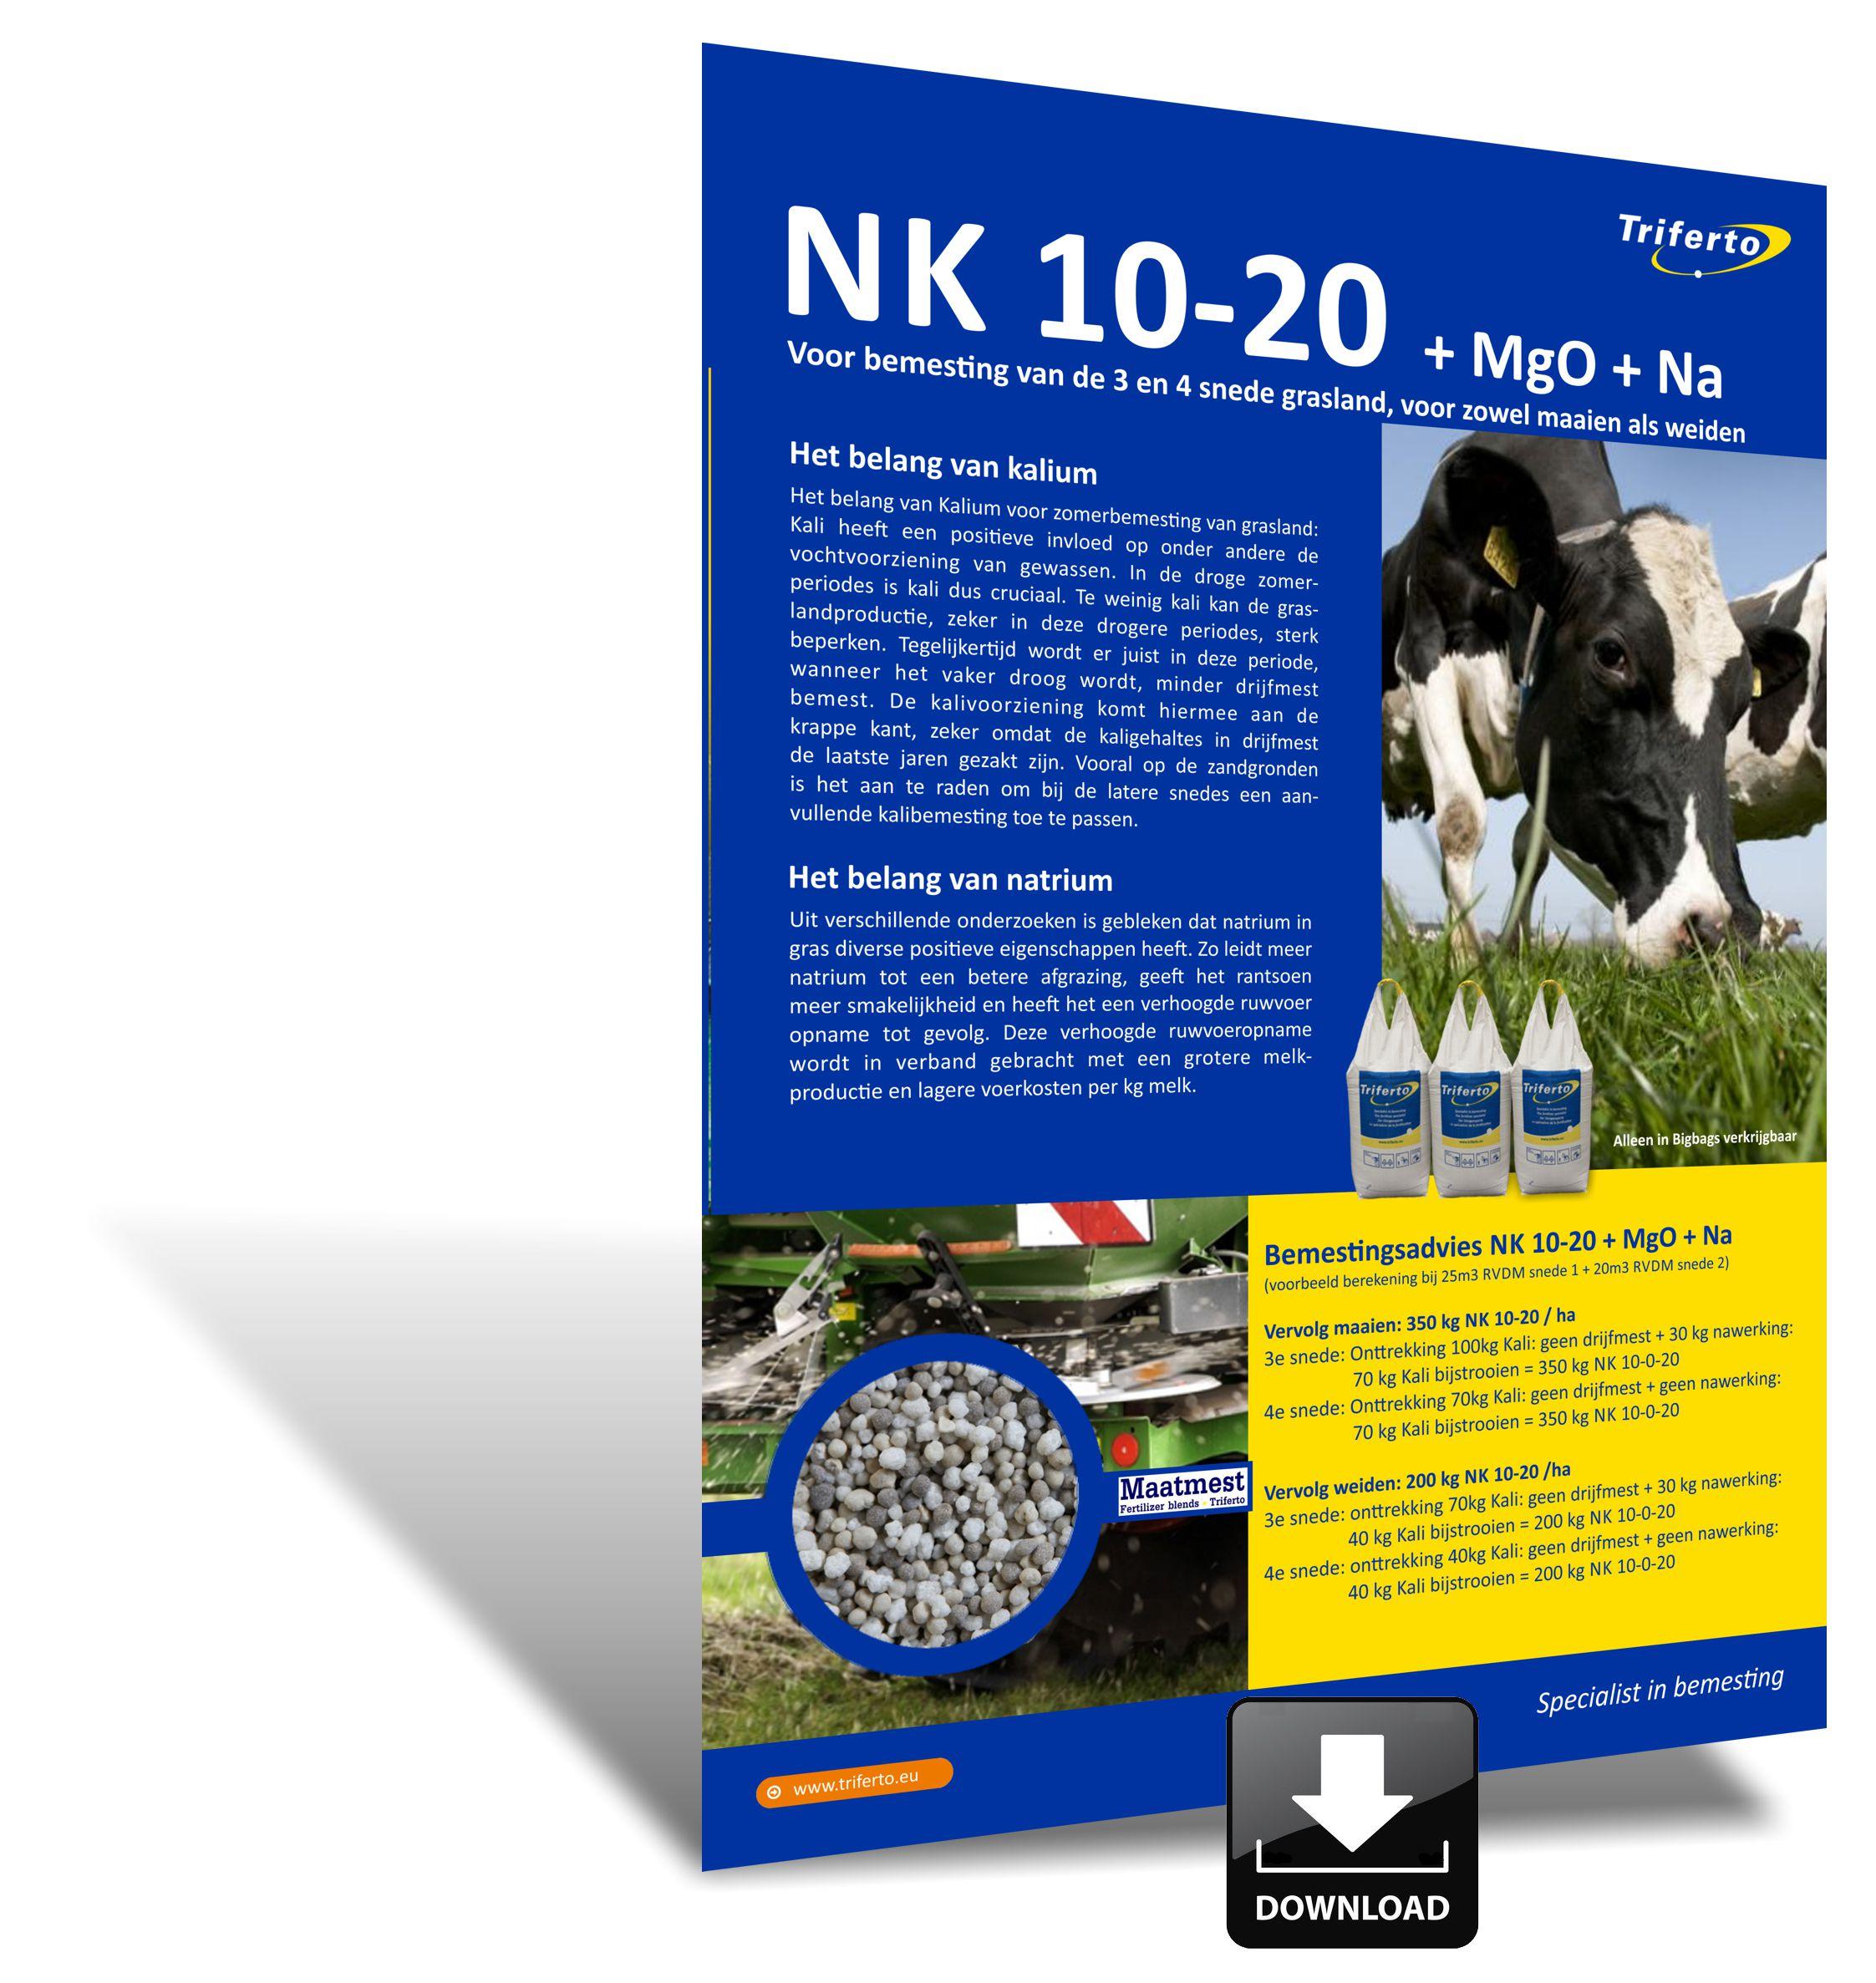 NK 10-20